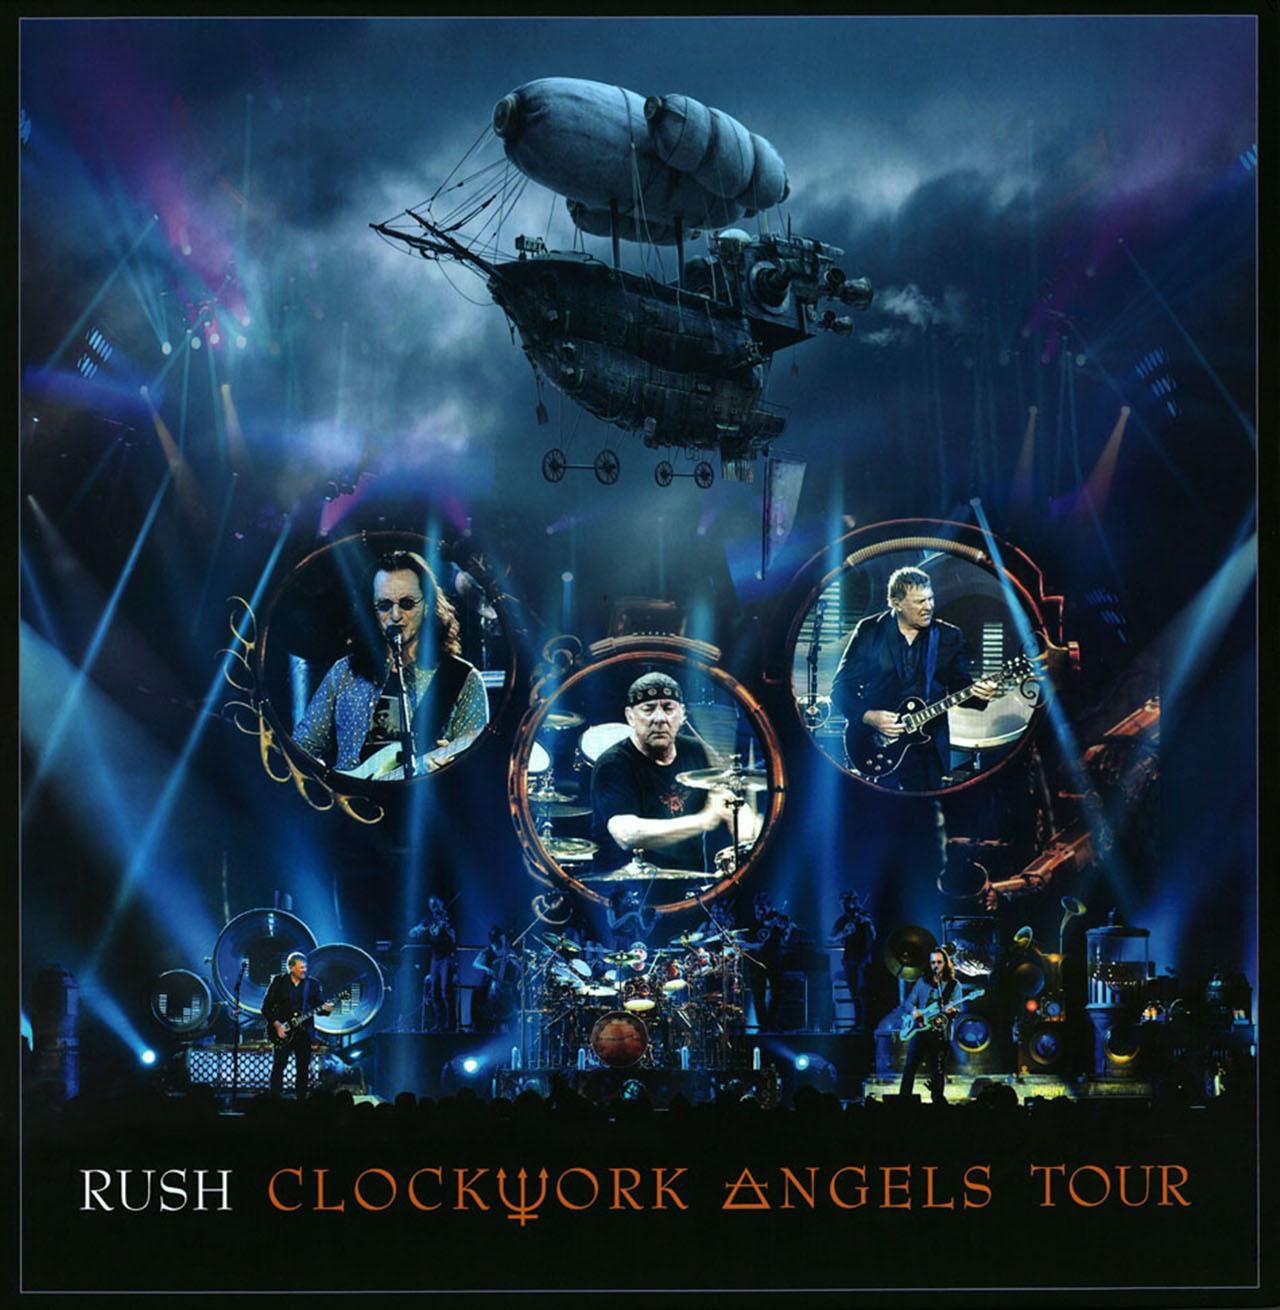 Rush's Clockwork Angels Tour set for 5LP vinyl set | Louder